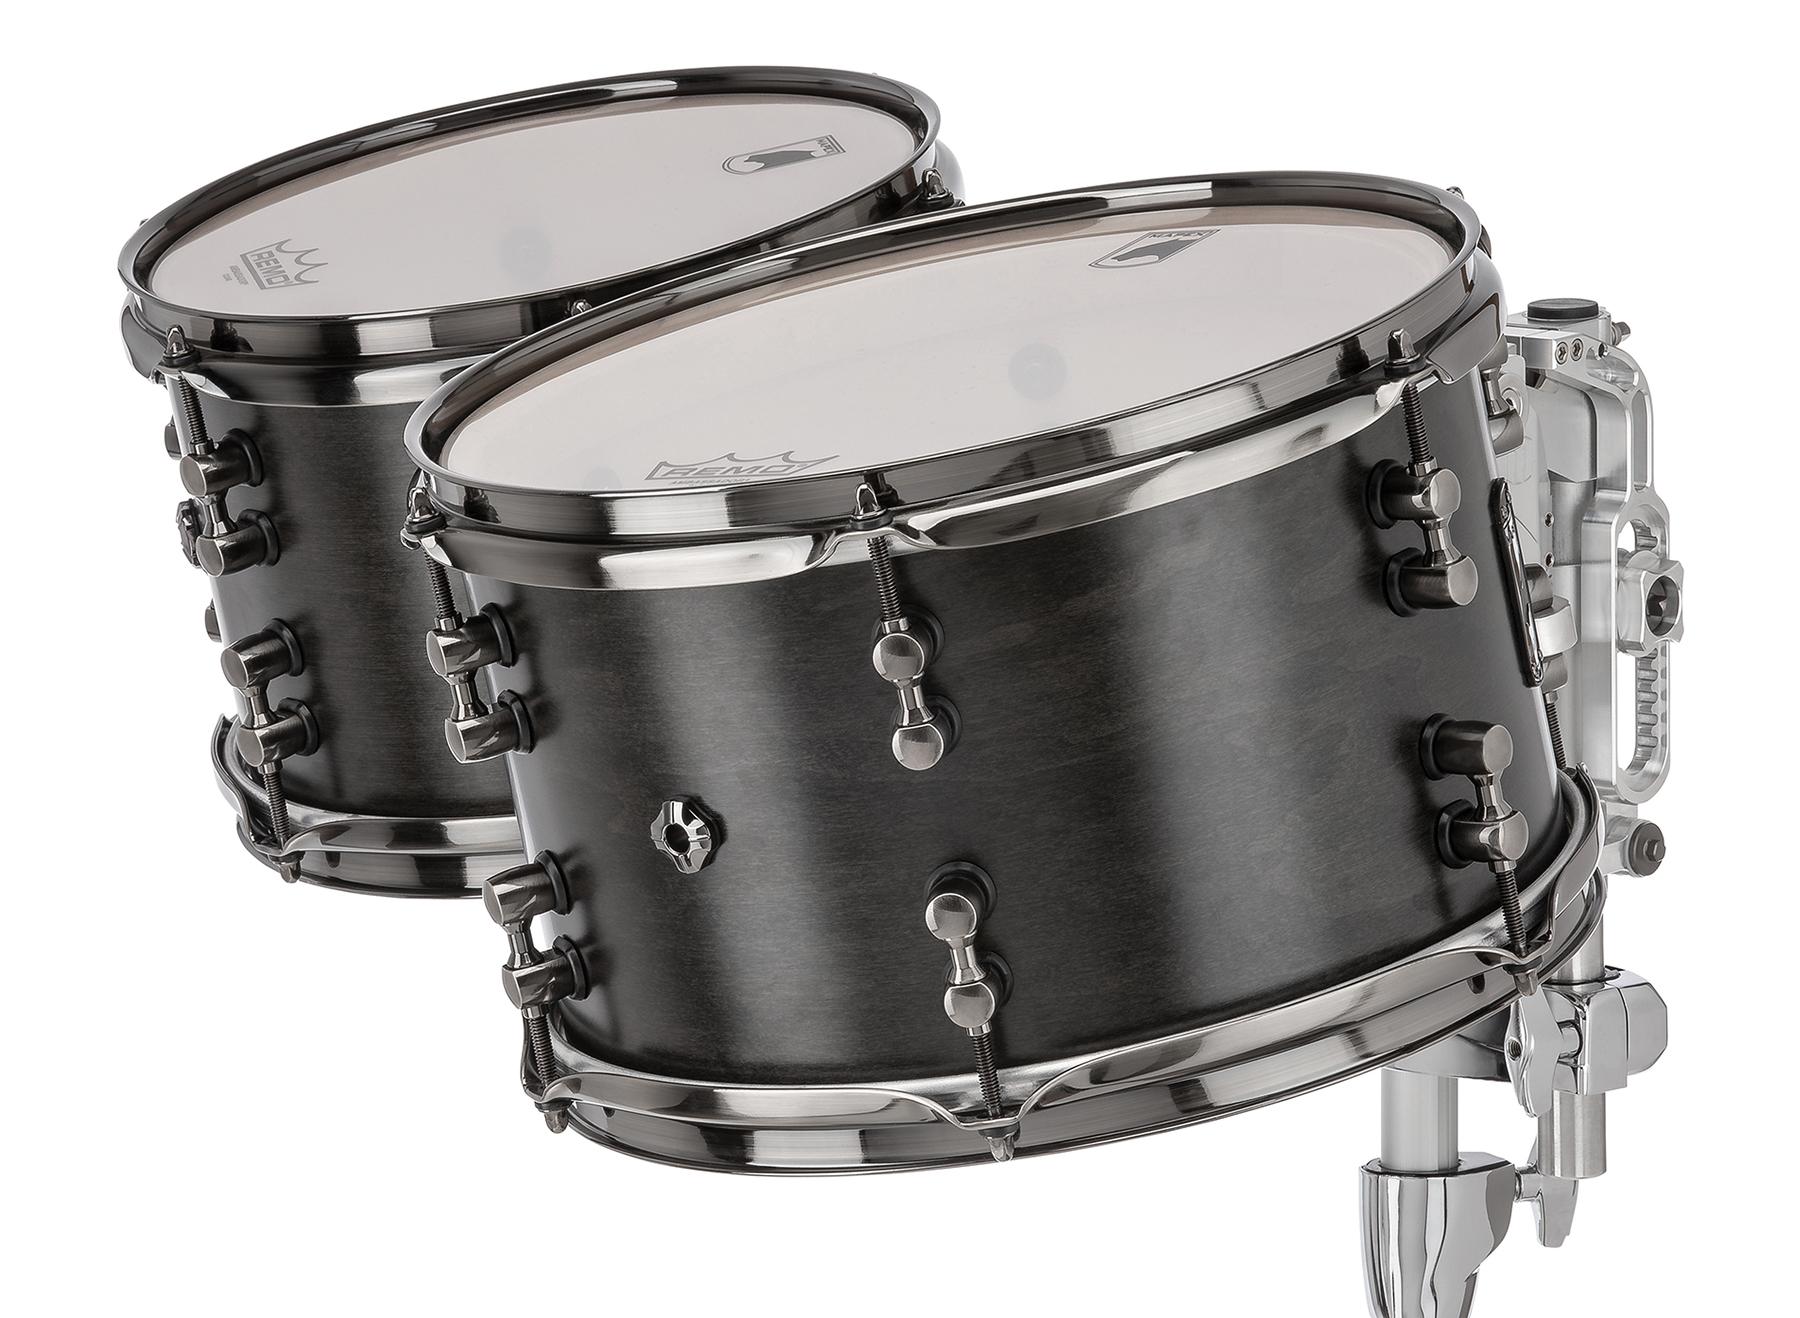 MAATS-with-drums-02.jpg